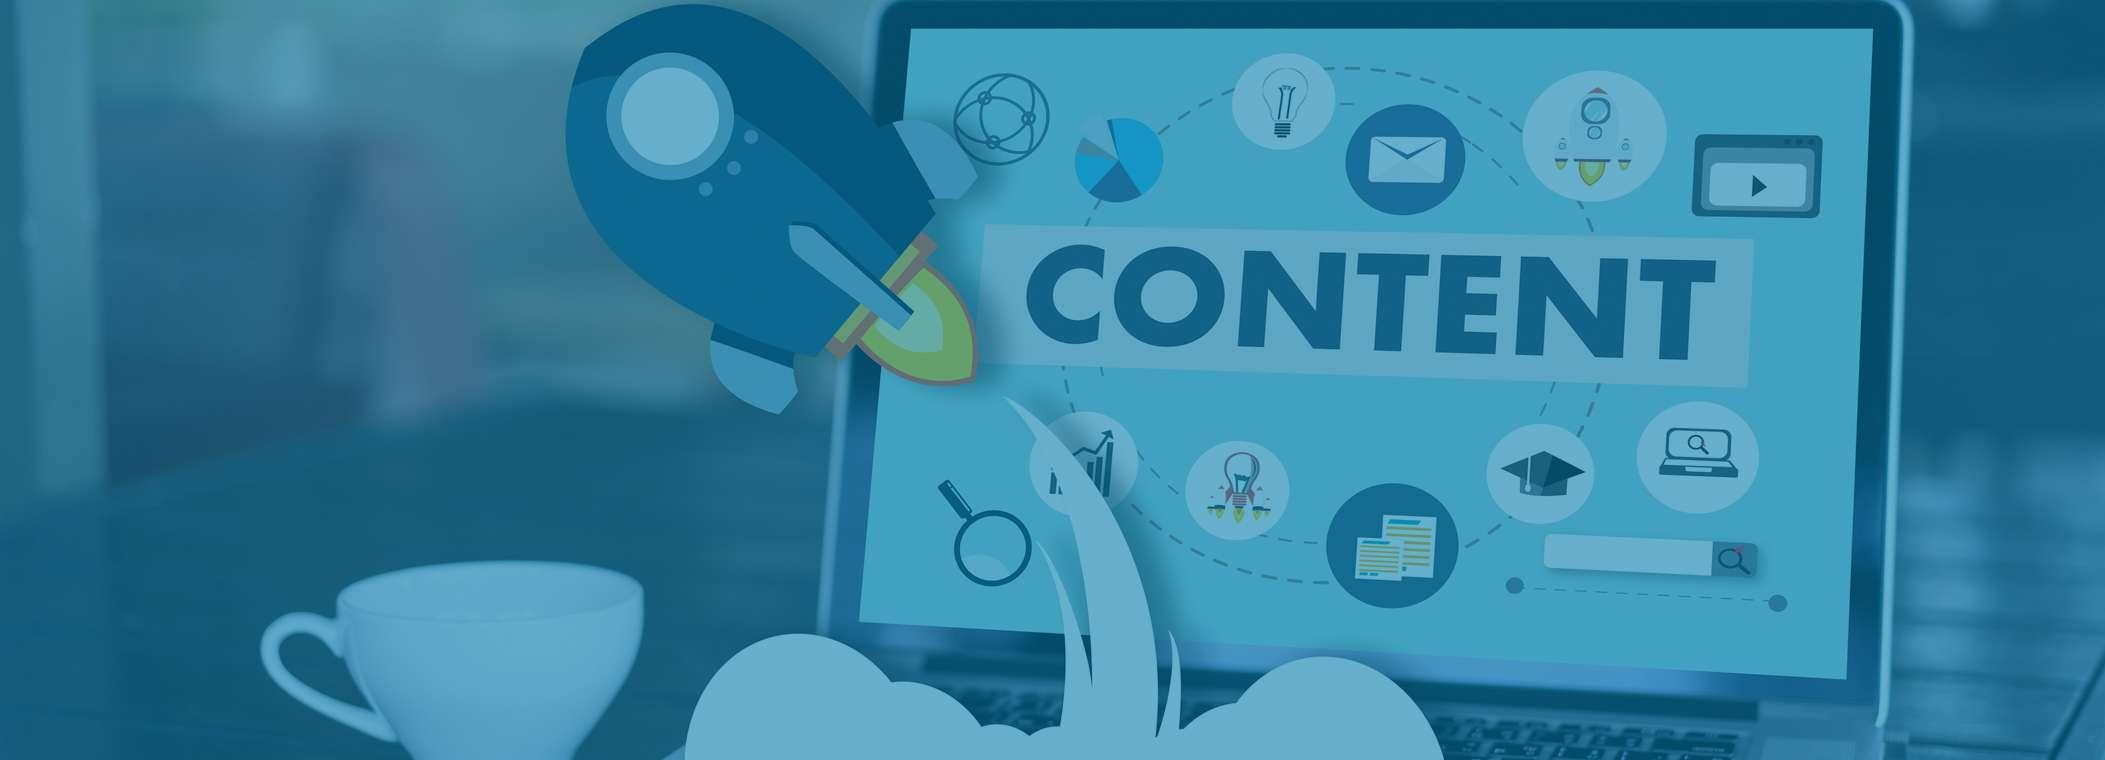 Nonprofit_Content_Marketing-1-1